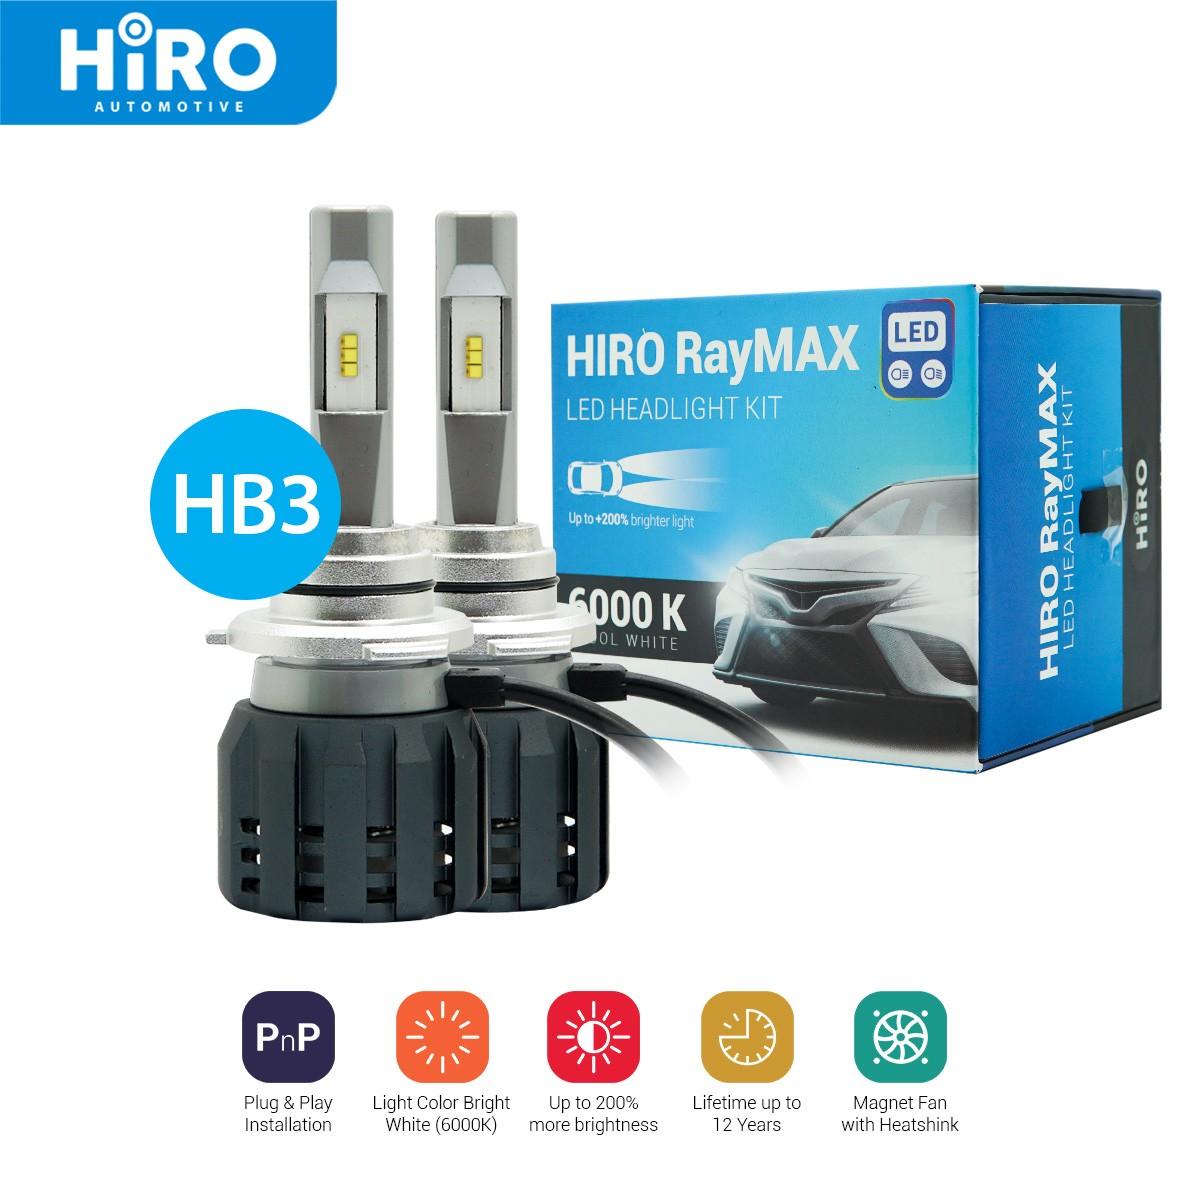 HIRO LED RAYMAX - LAMPU LED HB3 6000K